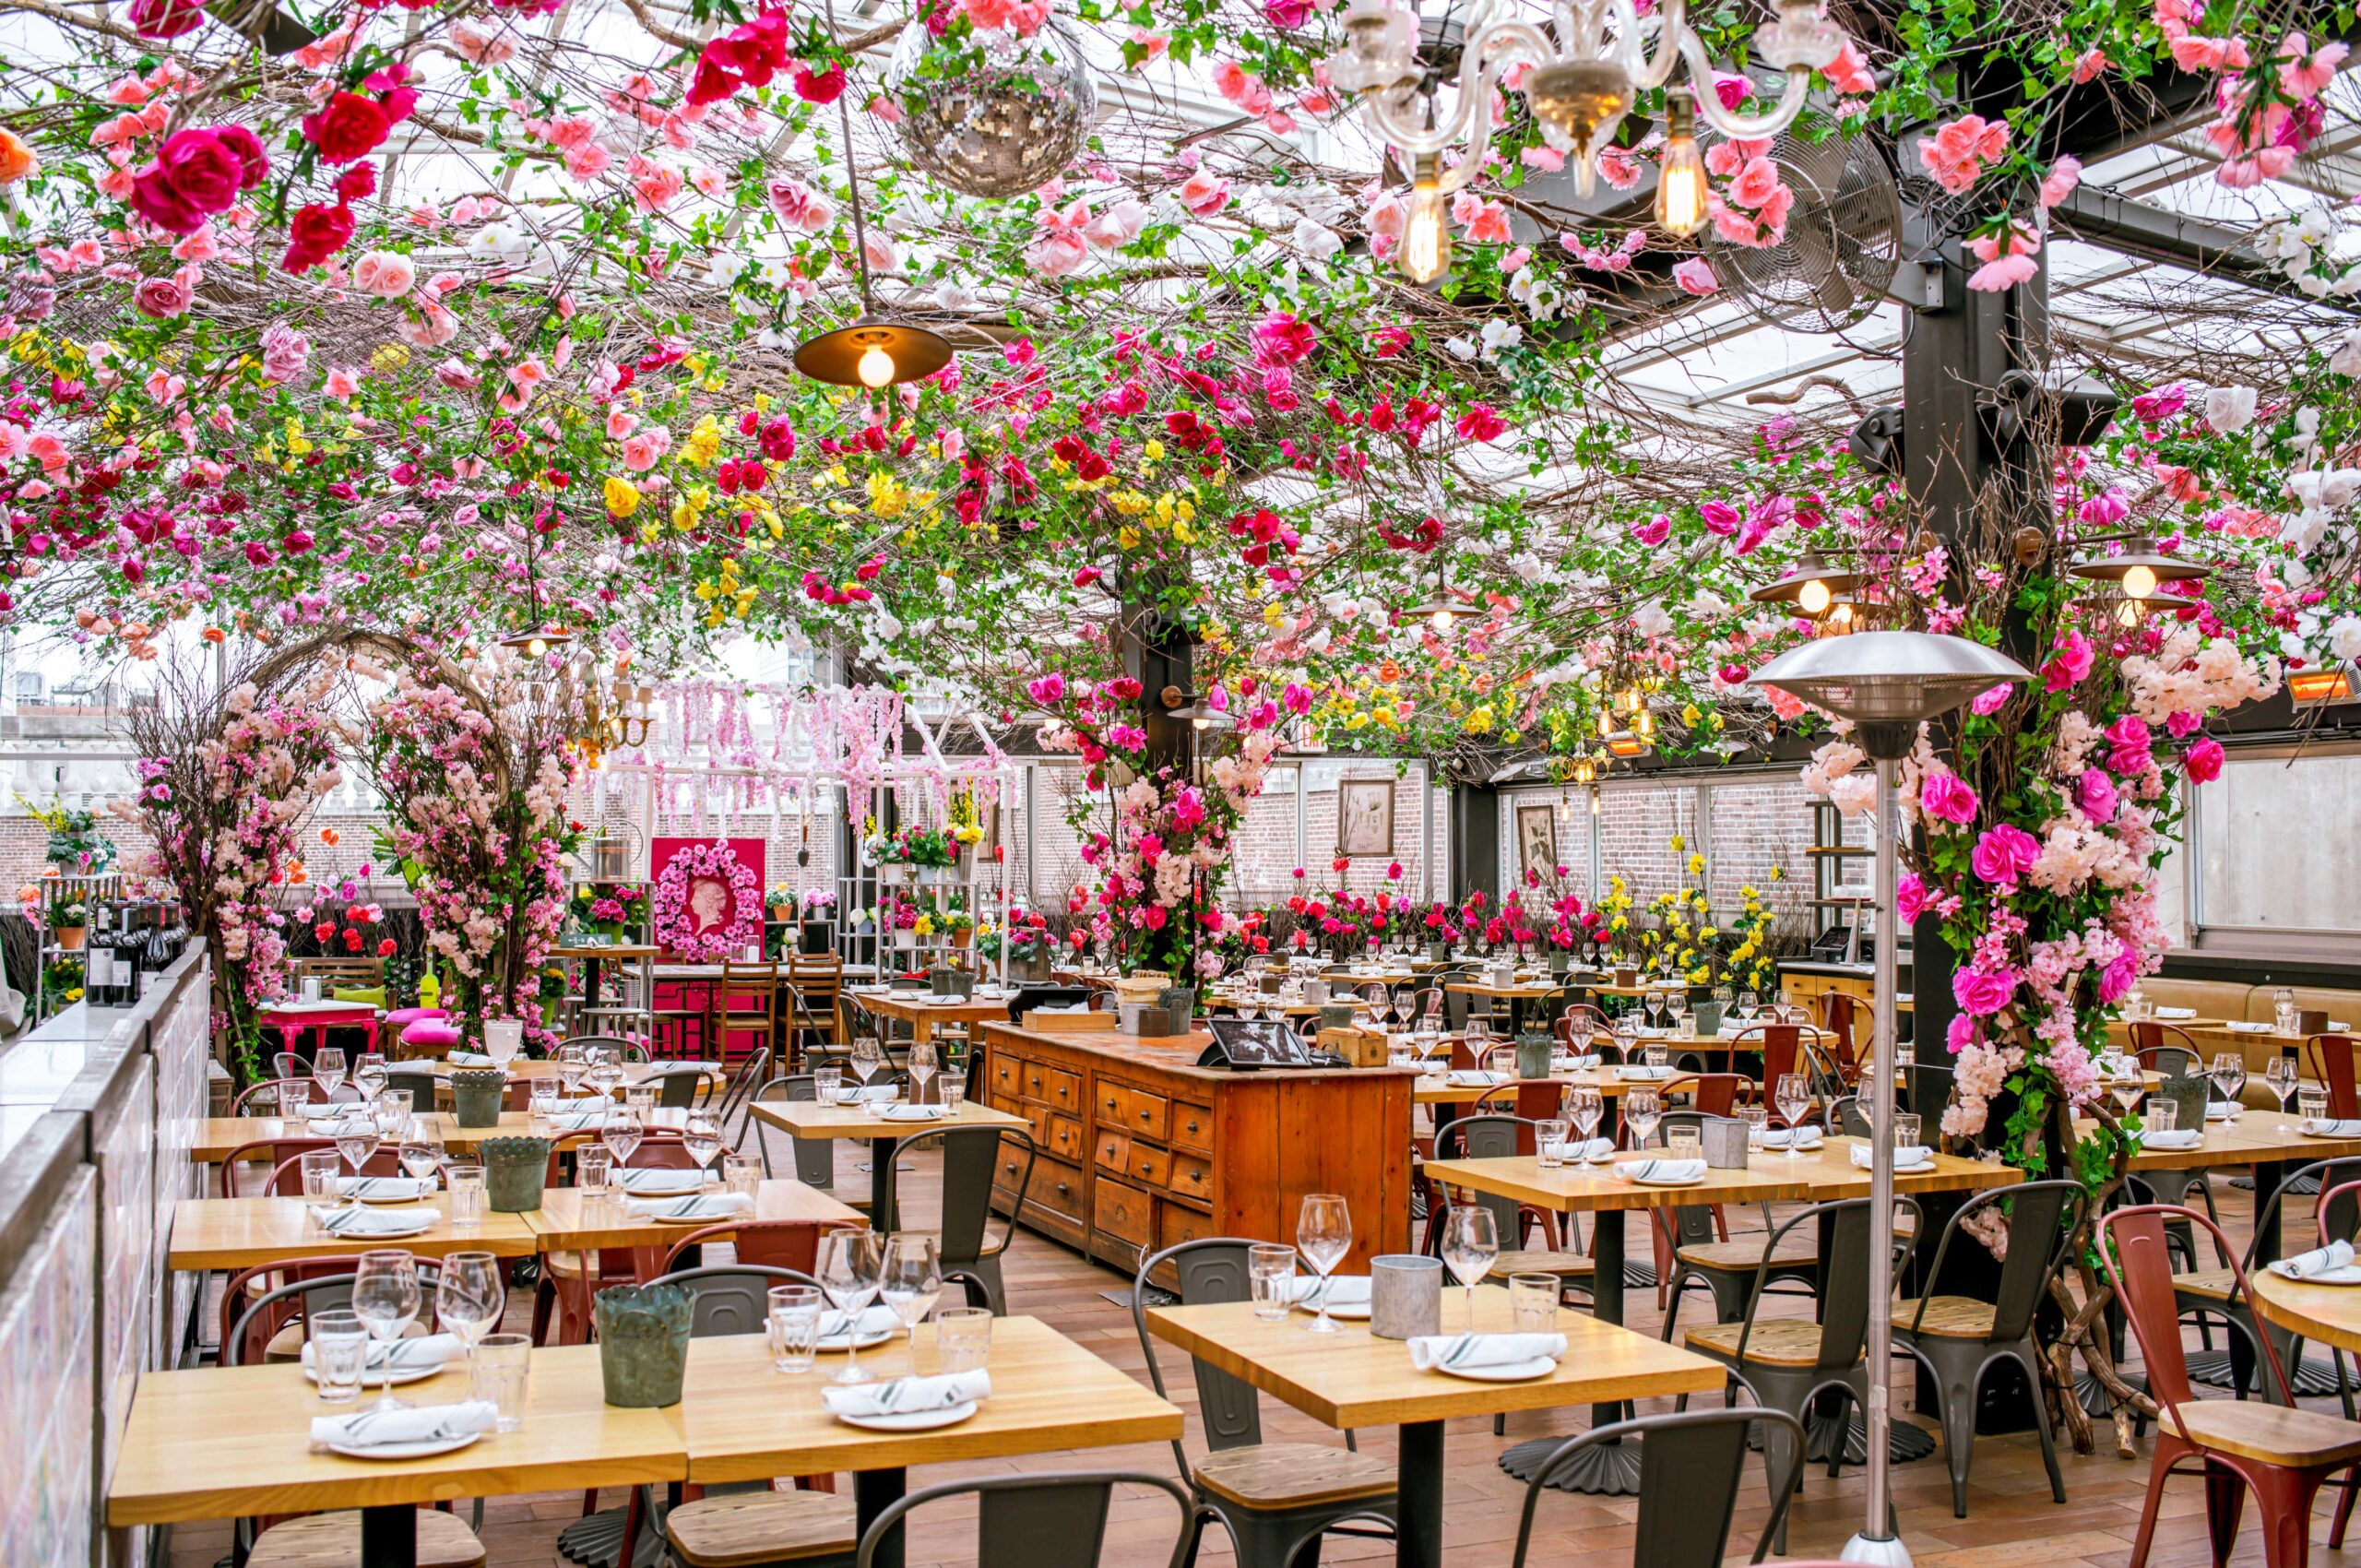 SERRA by Birreria restaurant interior